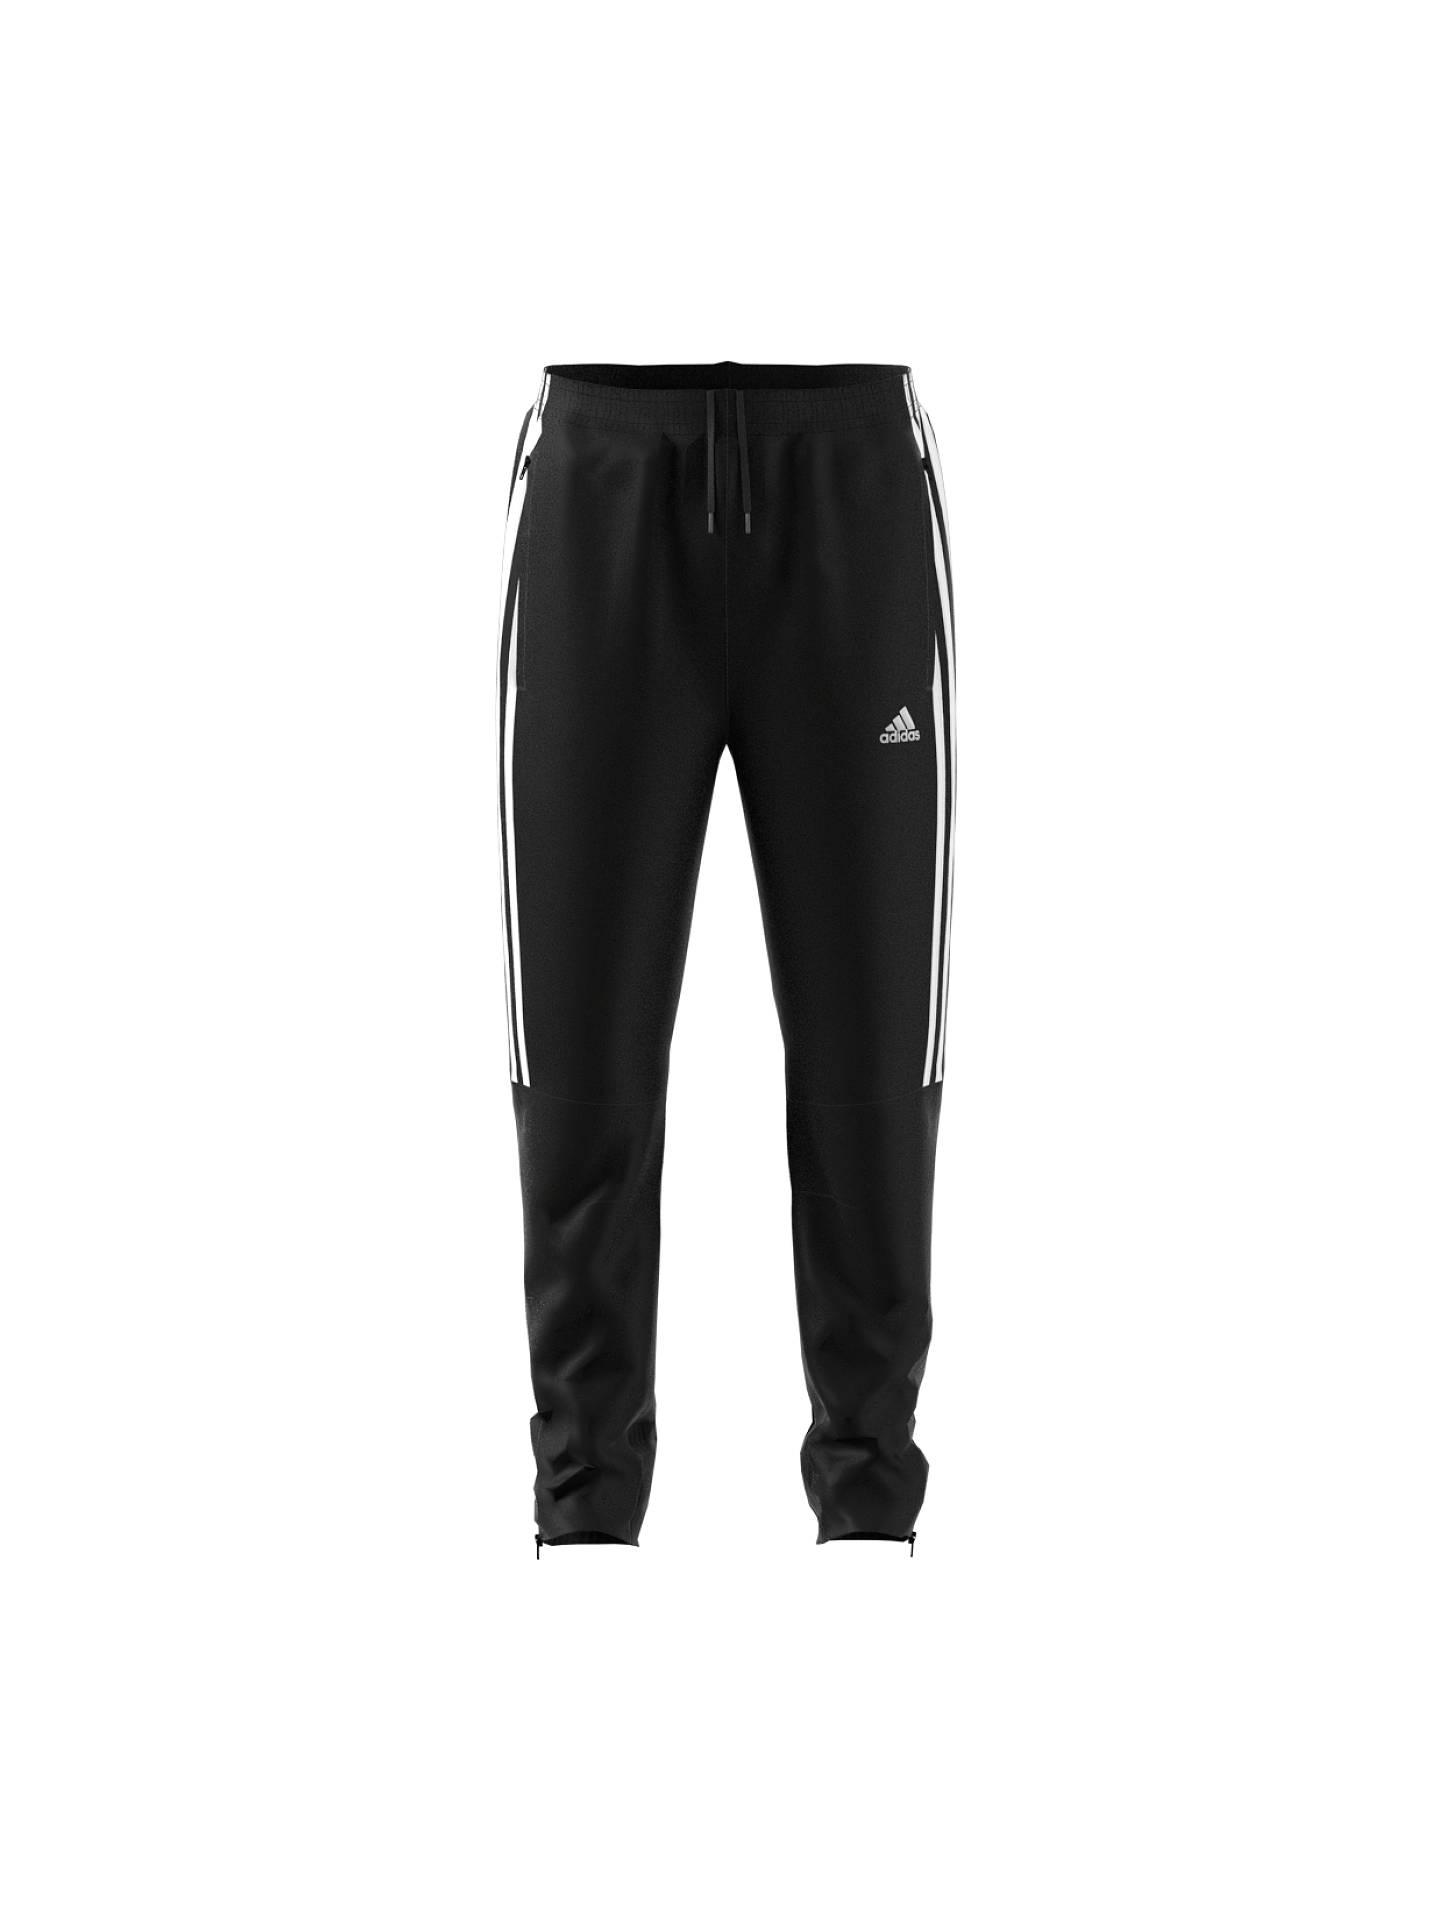 2042ac56a Adidas Boys' 3-Stripe Tiro Tracksuit Bottoms, Black at John Lewis ...